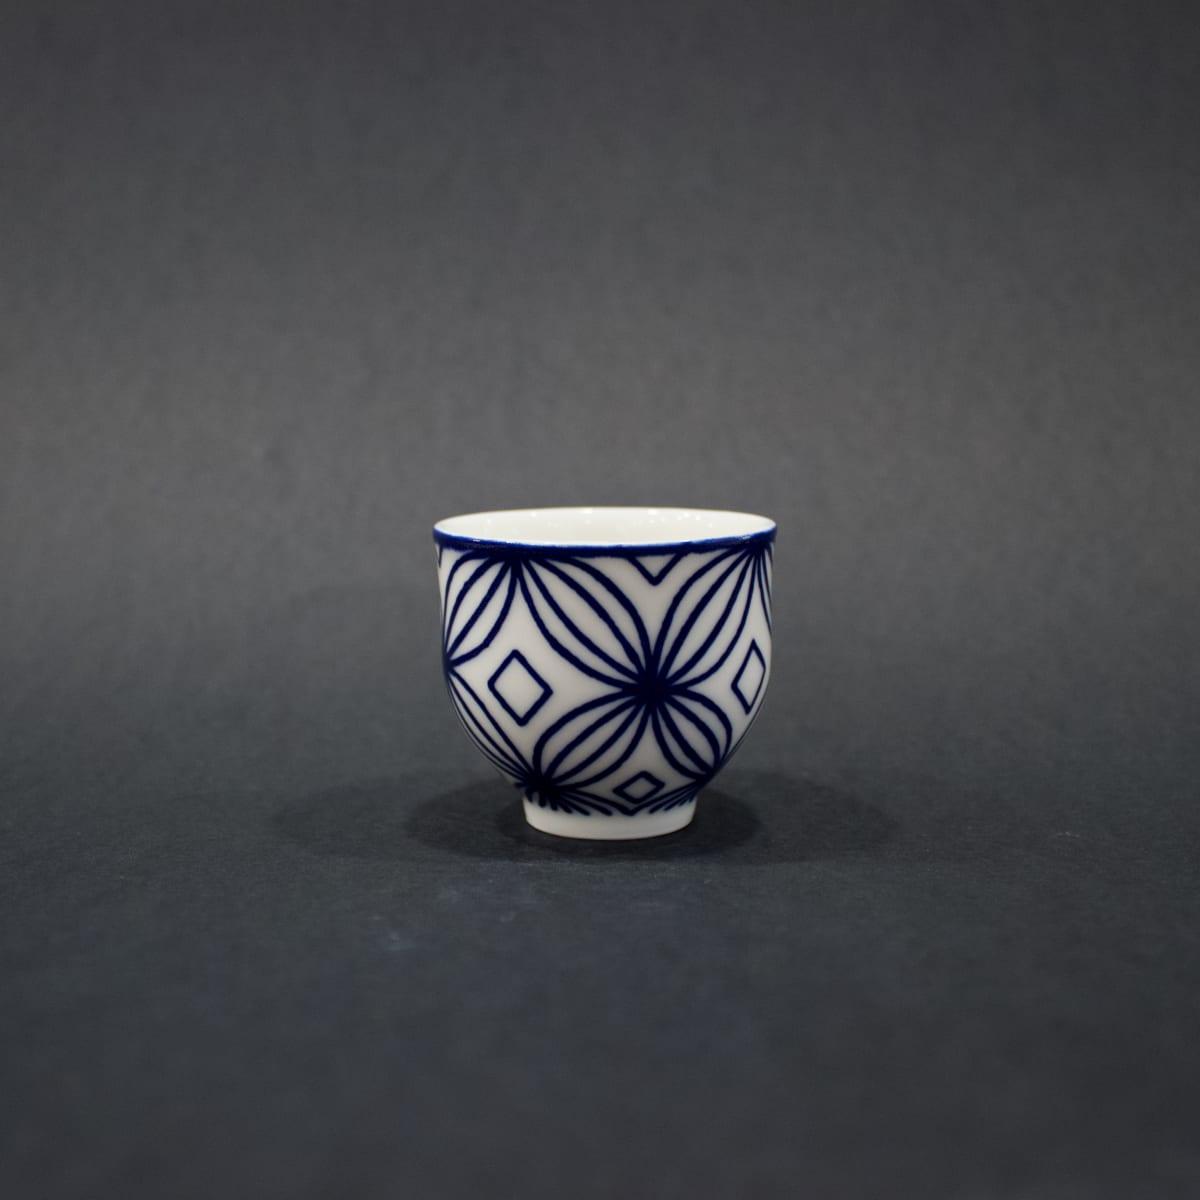 Rhian Malin Frangipani Cup, 2019 Porcelain 5 x 6 x 6 cm 2 x 2 3/8 x 2 3/8 in